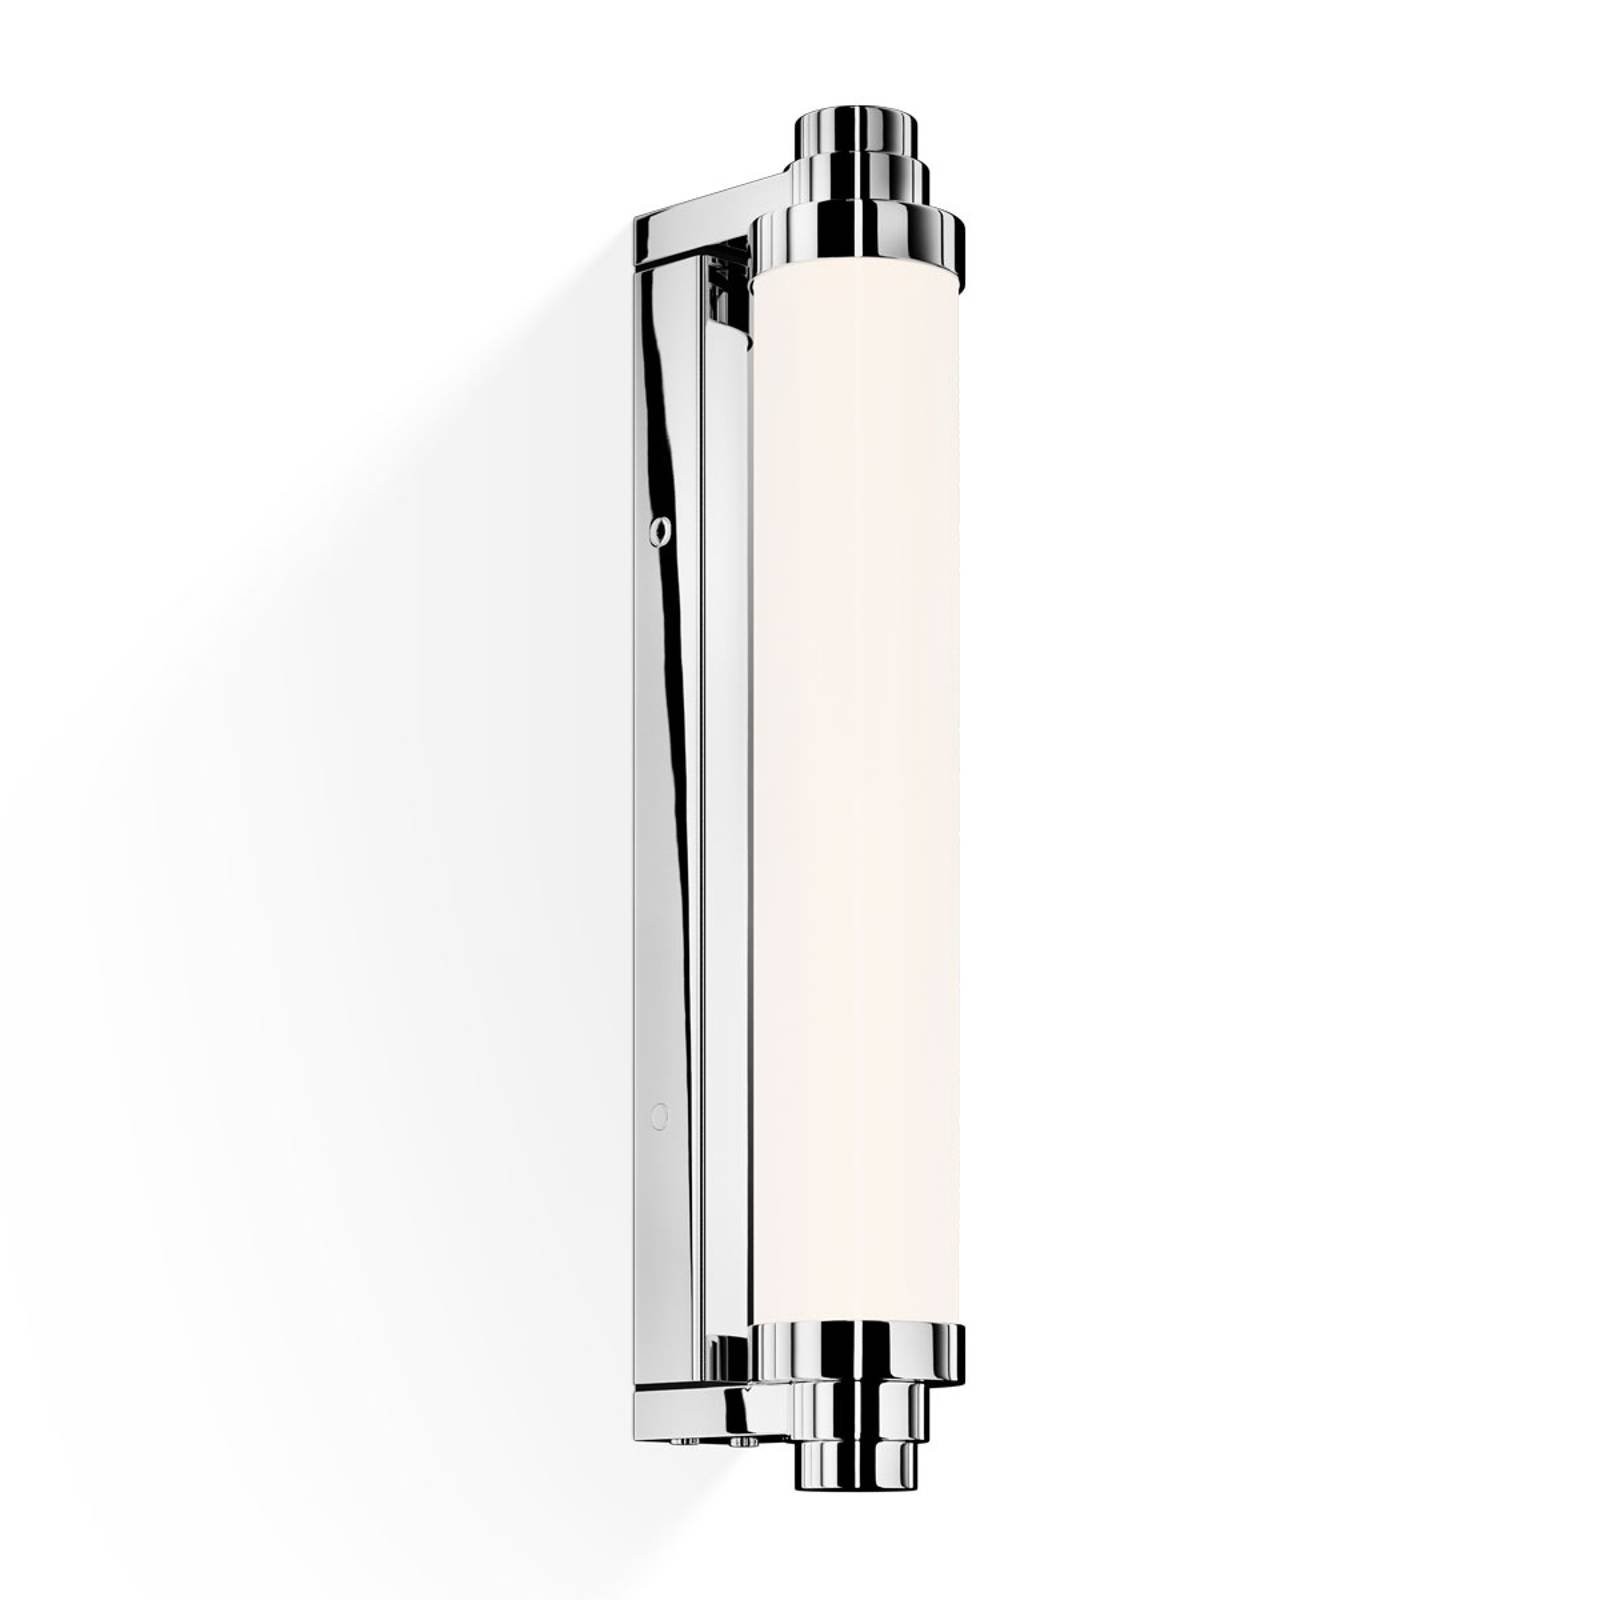 Decor Walther Vienna vegglampe 40 cm